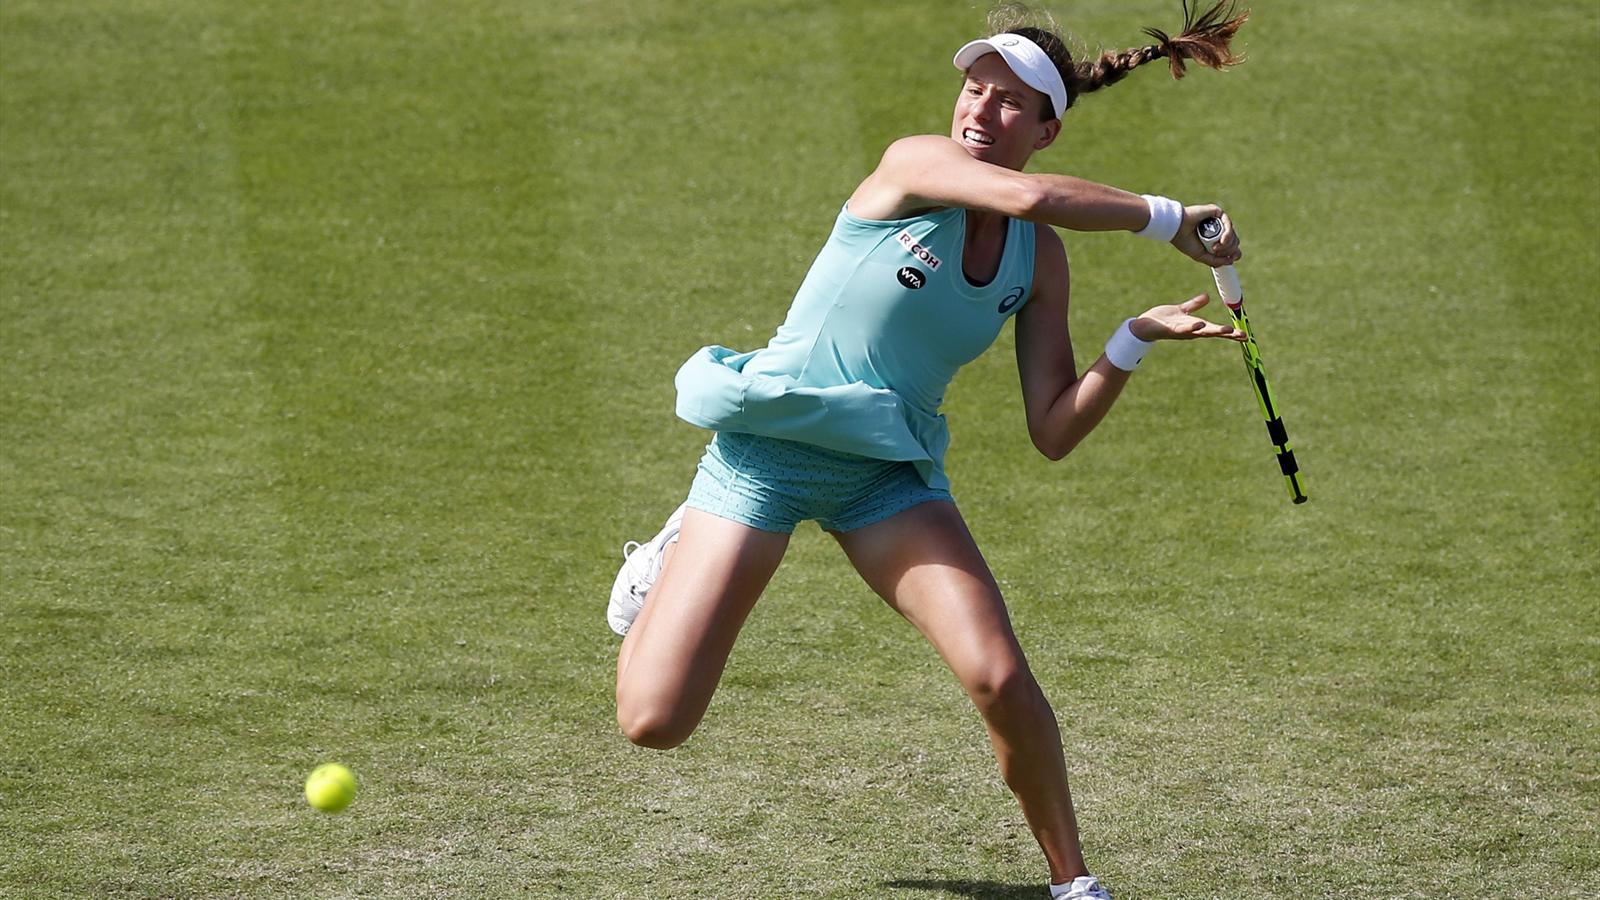 Johanna Konta beats Ekaterina Makarova to make Eastbourne semi-finals - Tennis - Eurosport UK